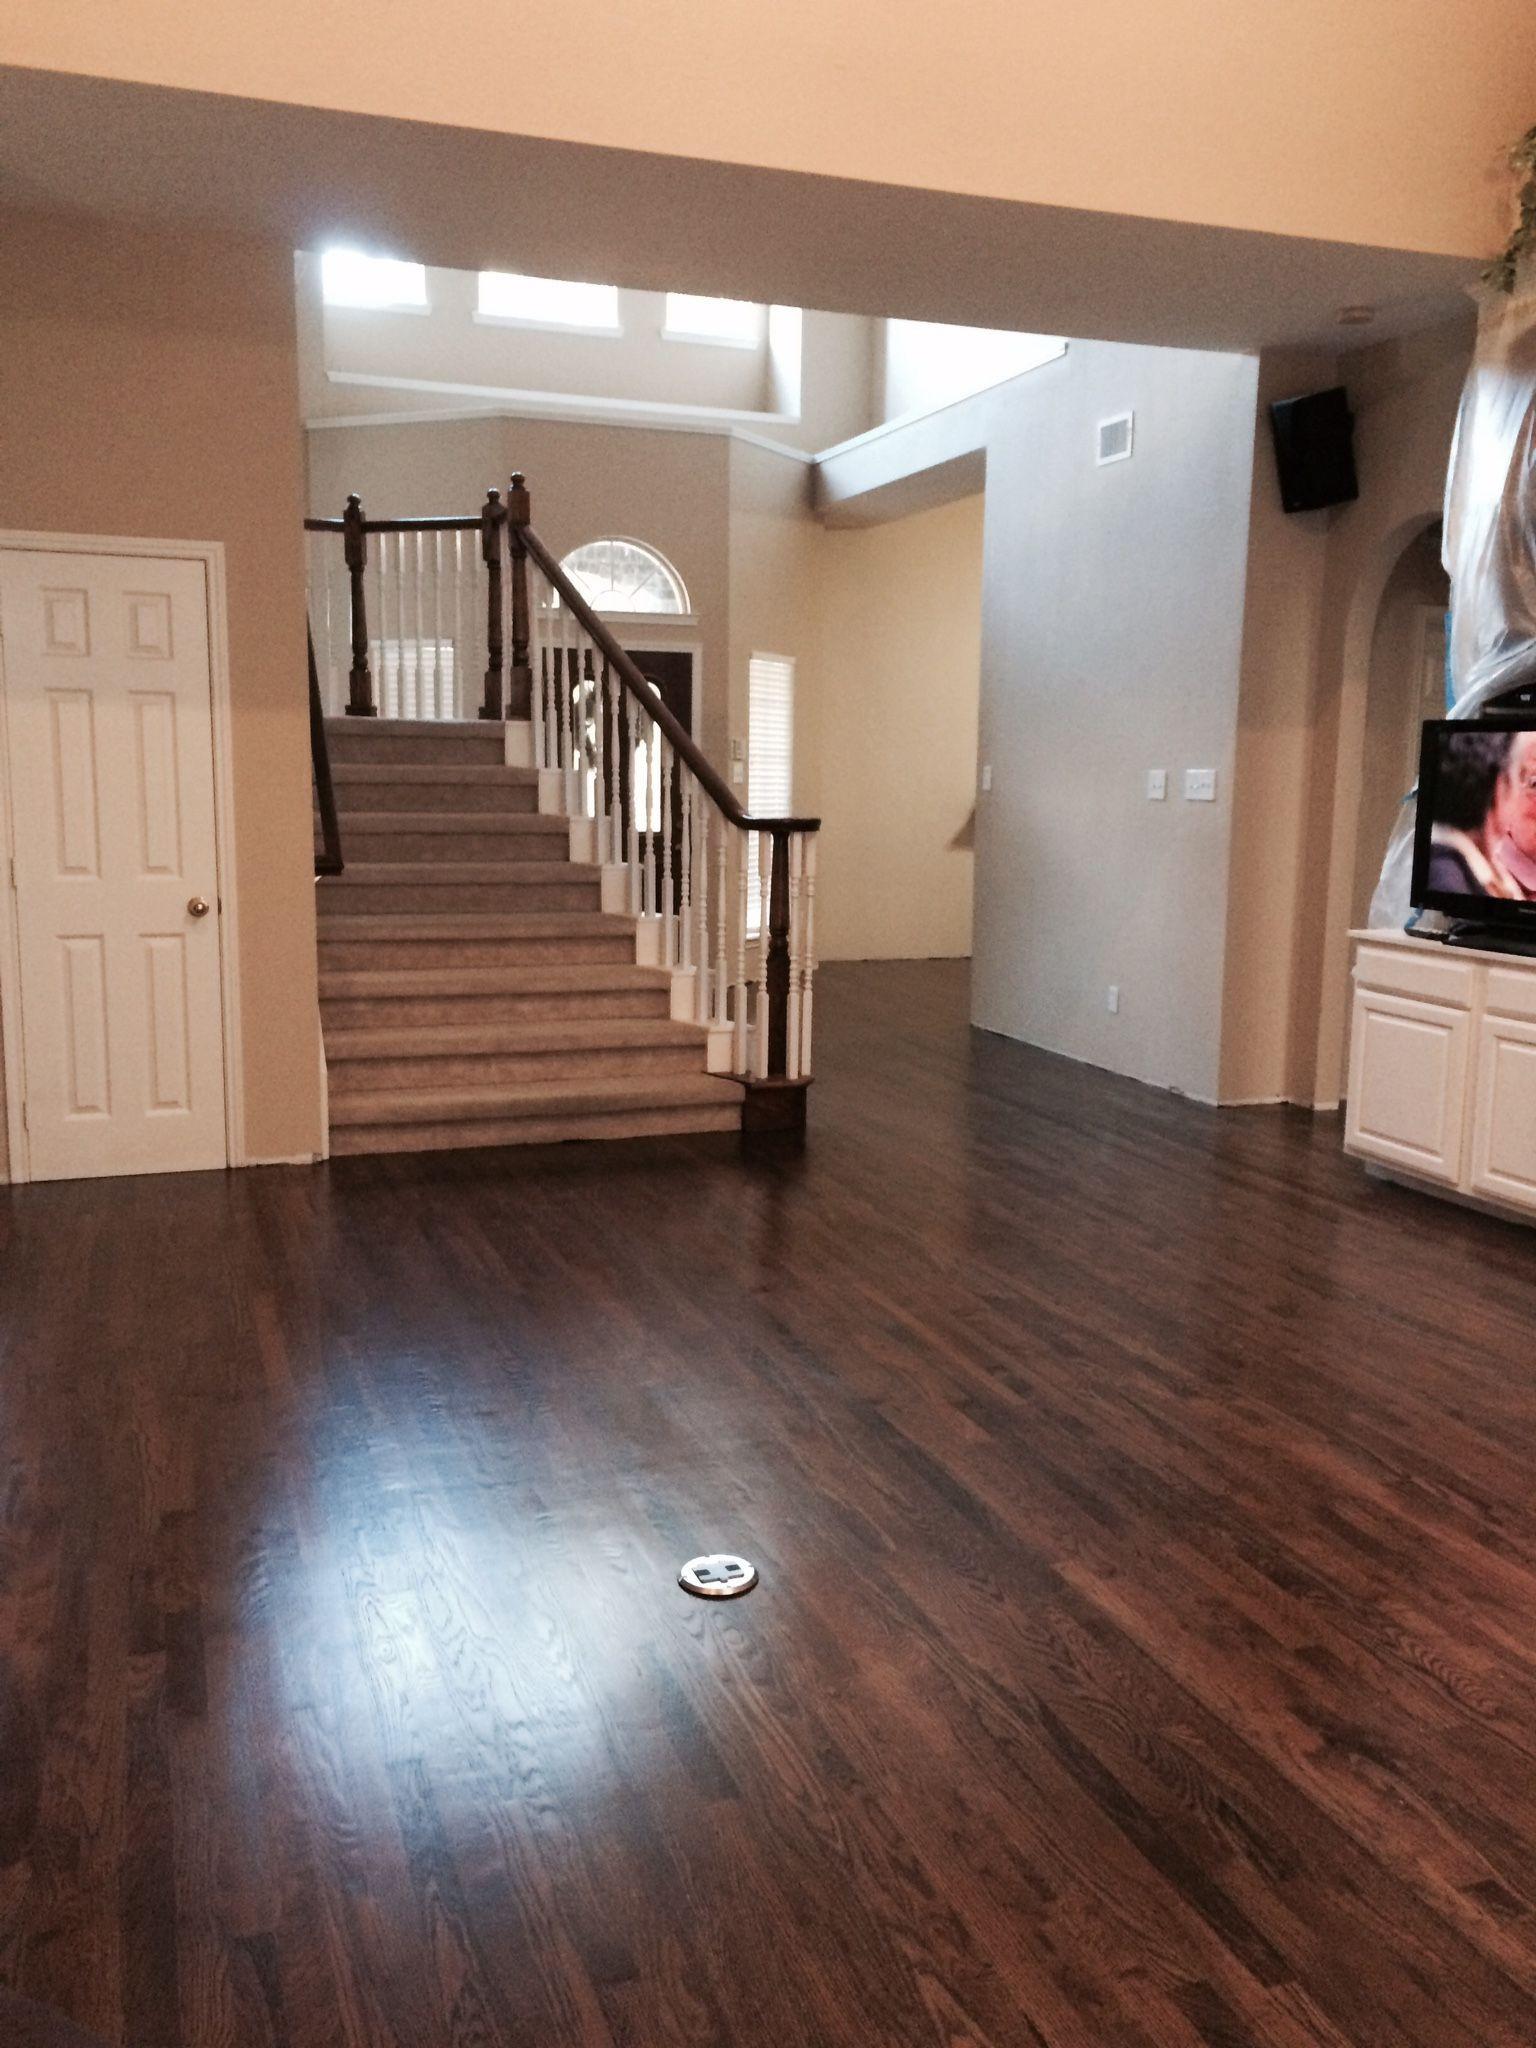 hardwood floor sanding and refinishing prices of dark walnut stain on white oak hardwood remodel 1floors in 2018 with dark walnut stain on white oak hardwood walnut hardwood flooring hardwood floor stain colors